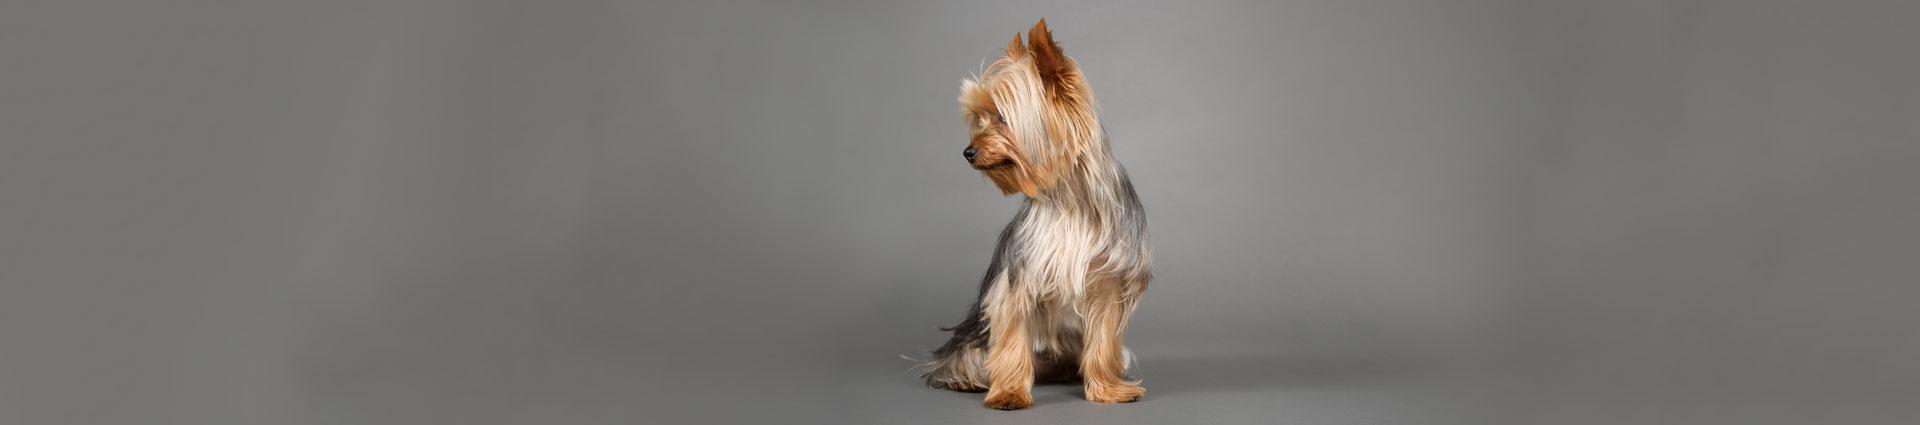 1920x400_CanineSpa_FNL